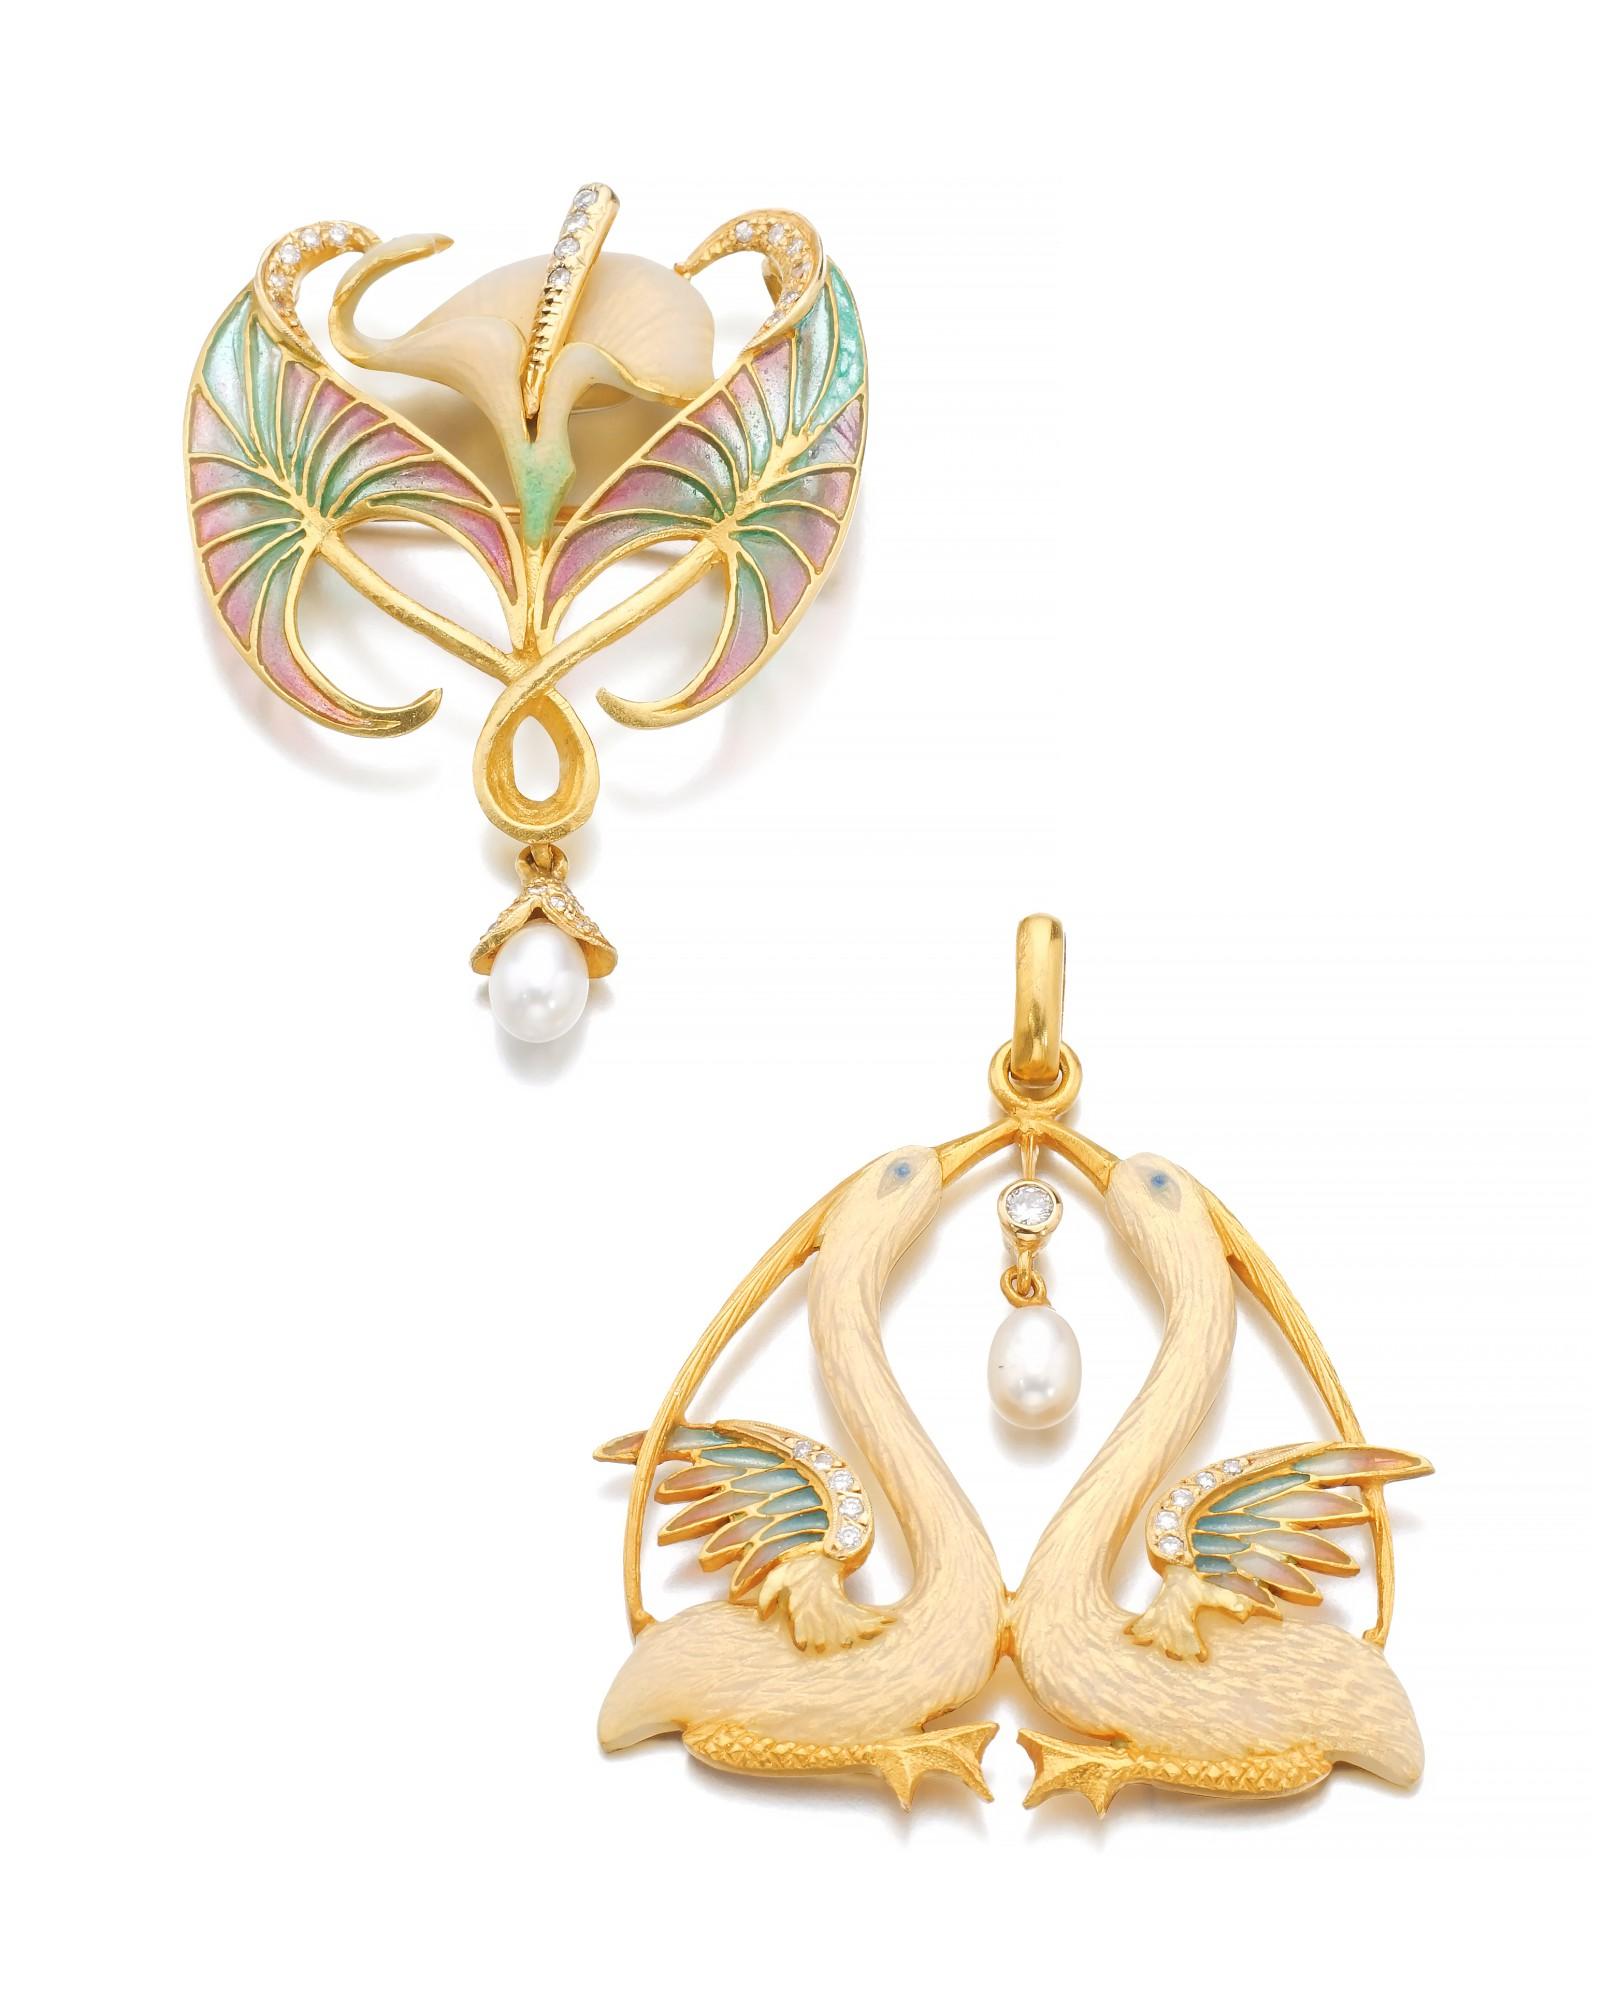 TWO ENAMEL, CULTURED PEARL AND DIAMOND PENDANTS | MASRIERA